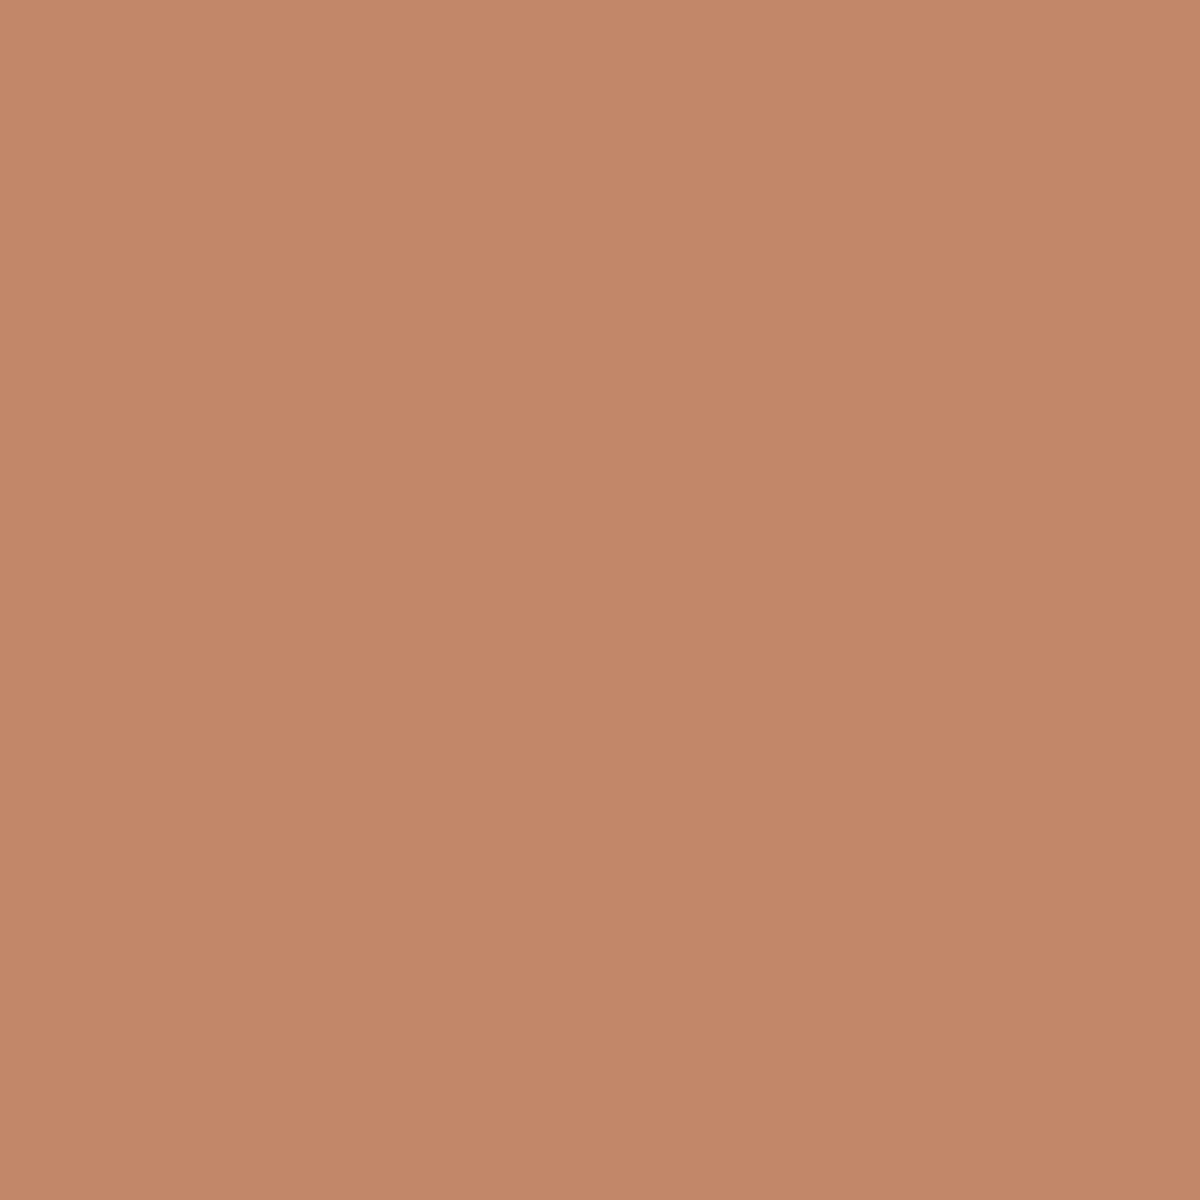 Toasted Nut Latar Belakang Warna Solid Warna Pastel Fotografi Warna